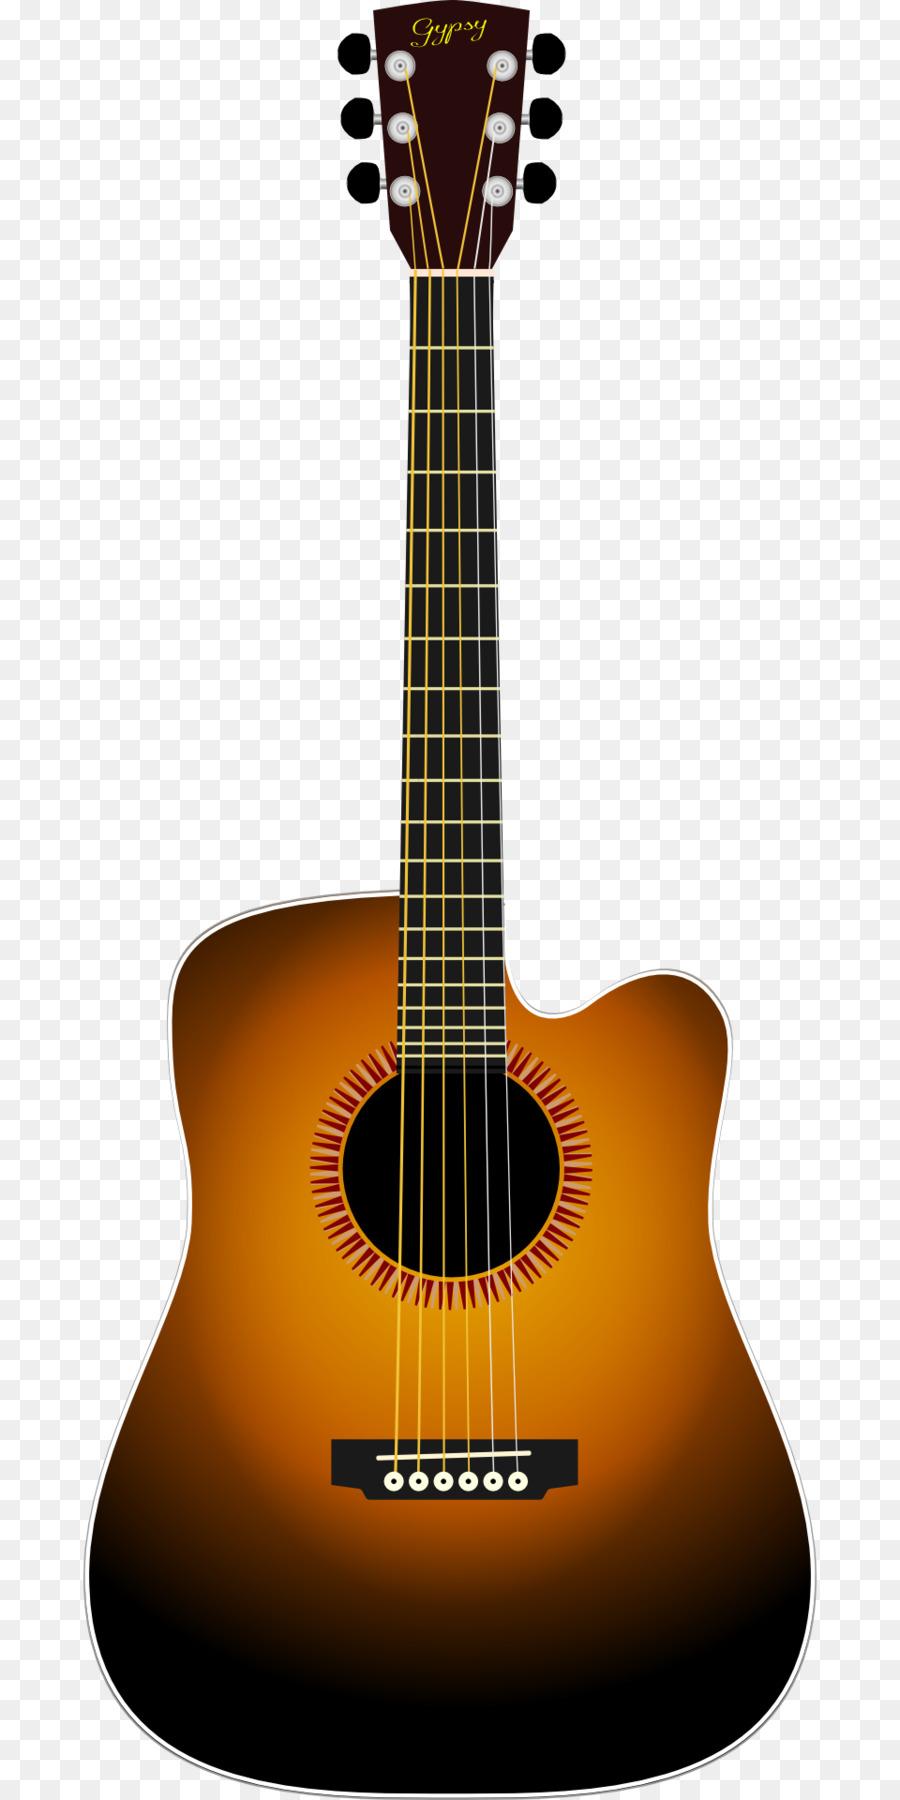 Gibson flying v guitar. Banjo clipart ukulele